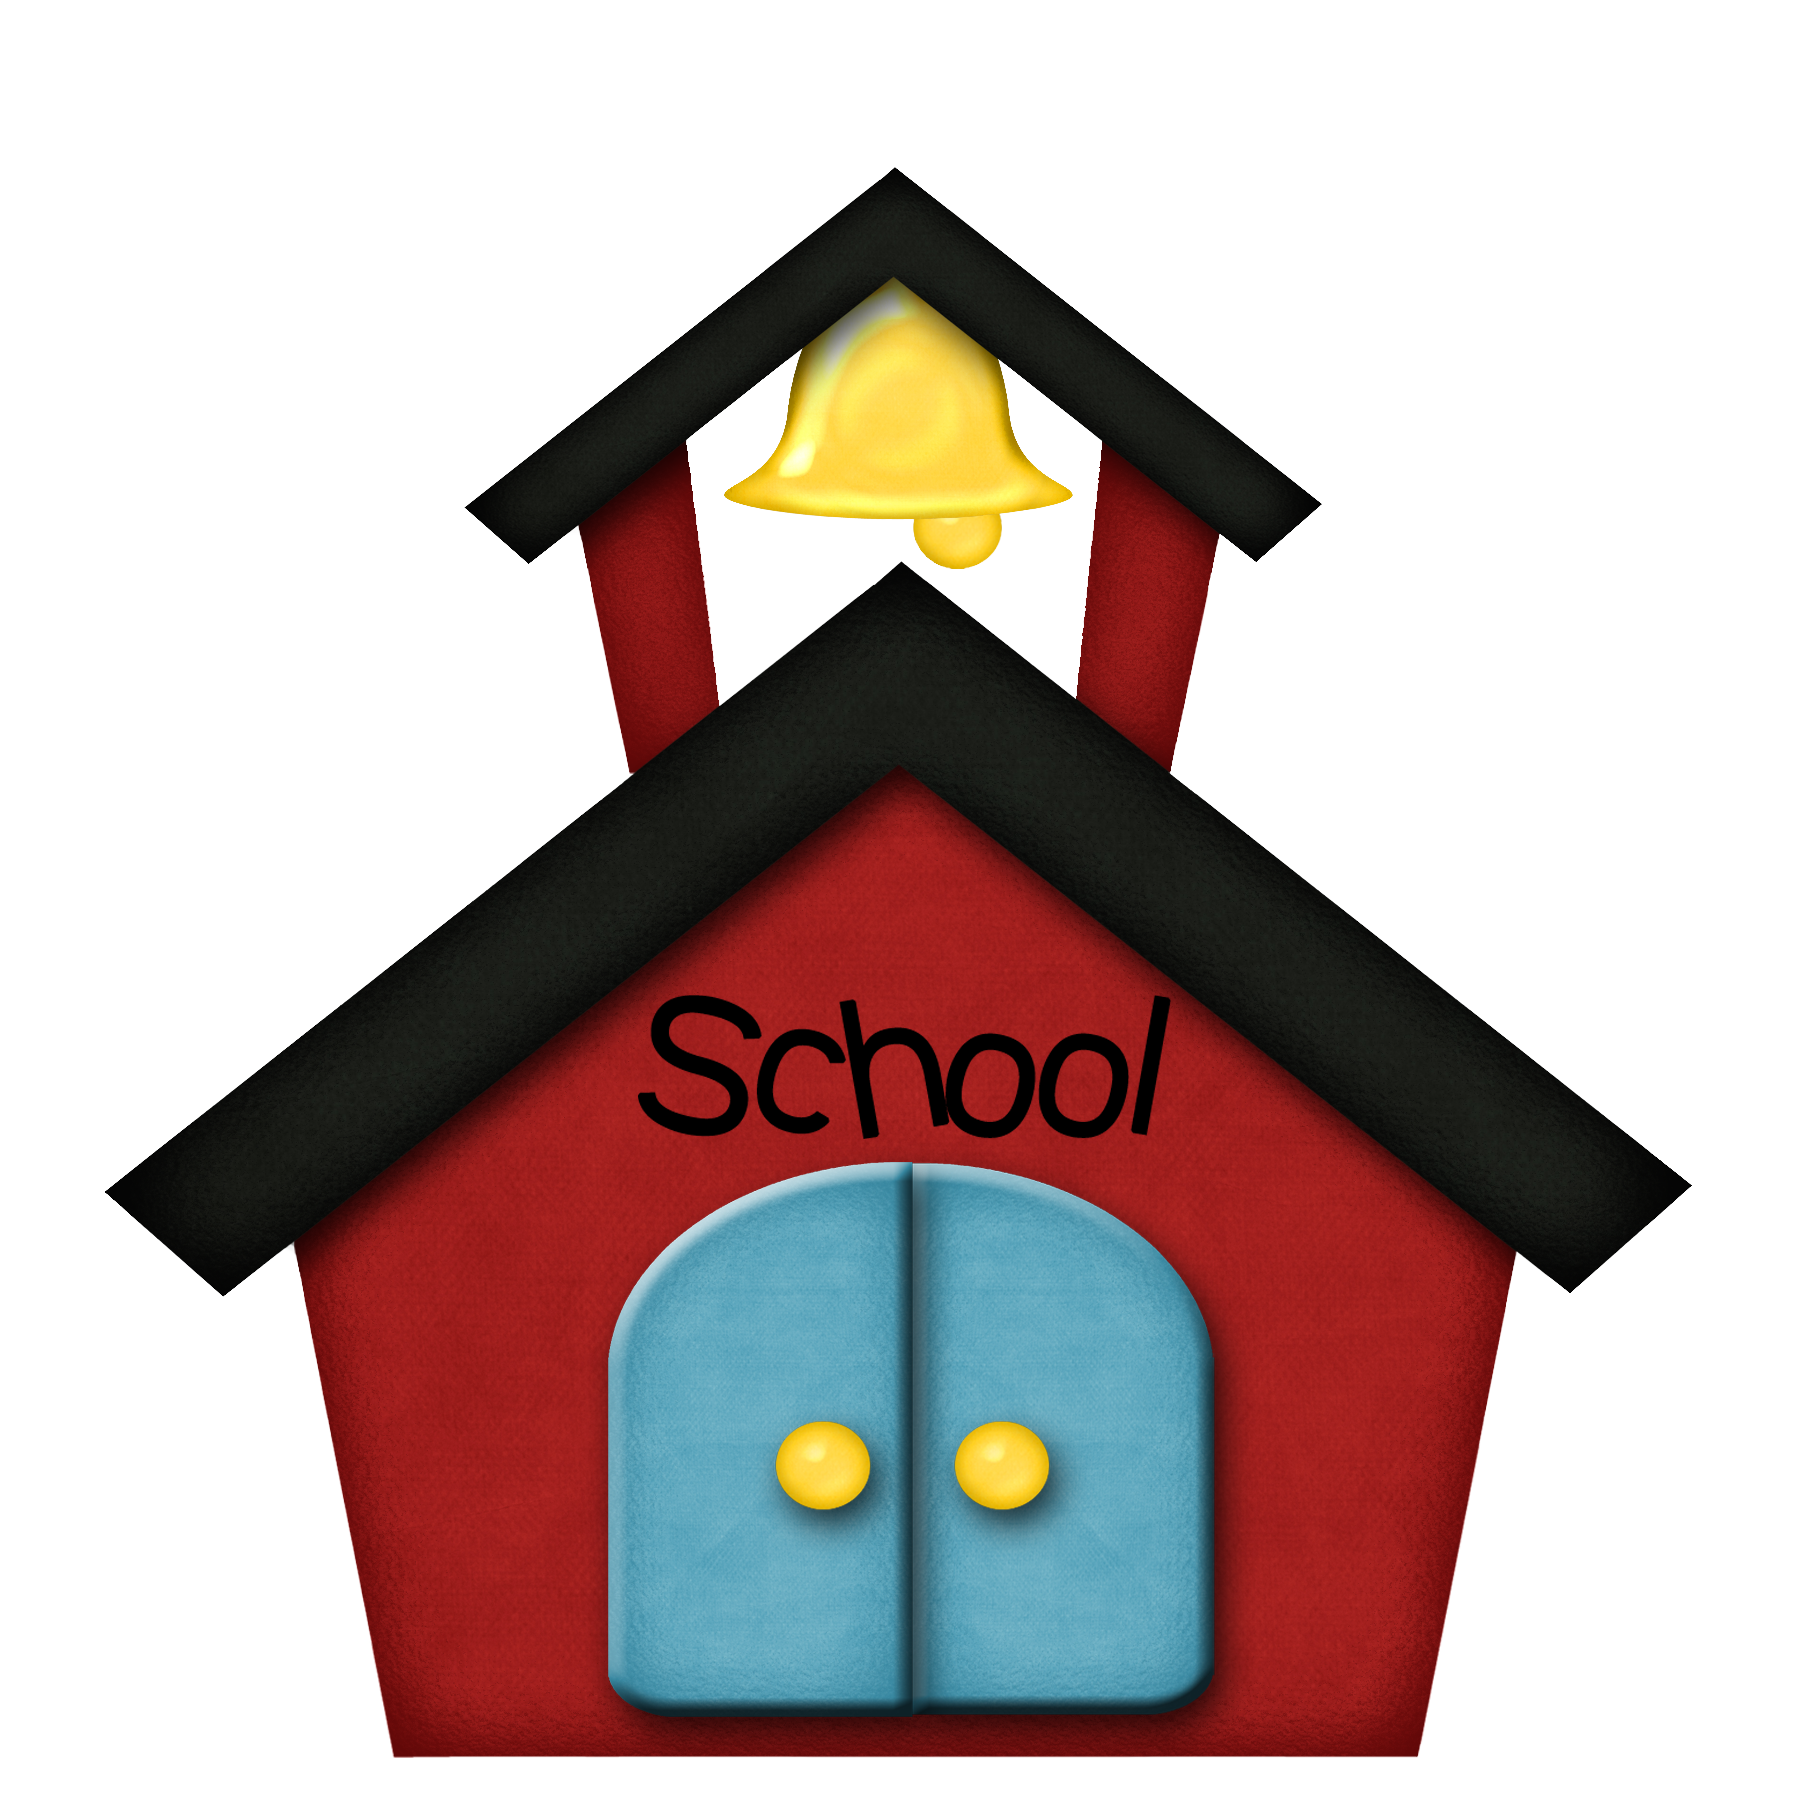 Schoolhouse clipart 3